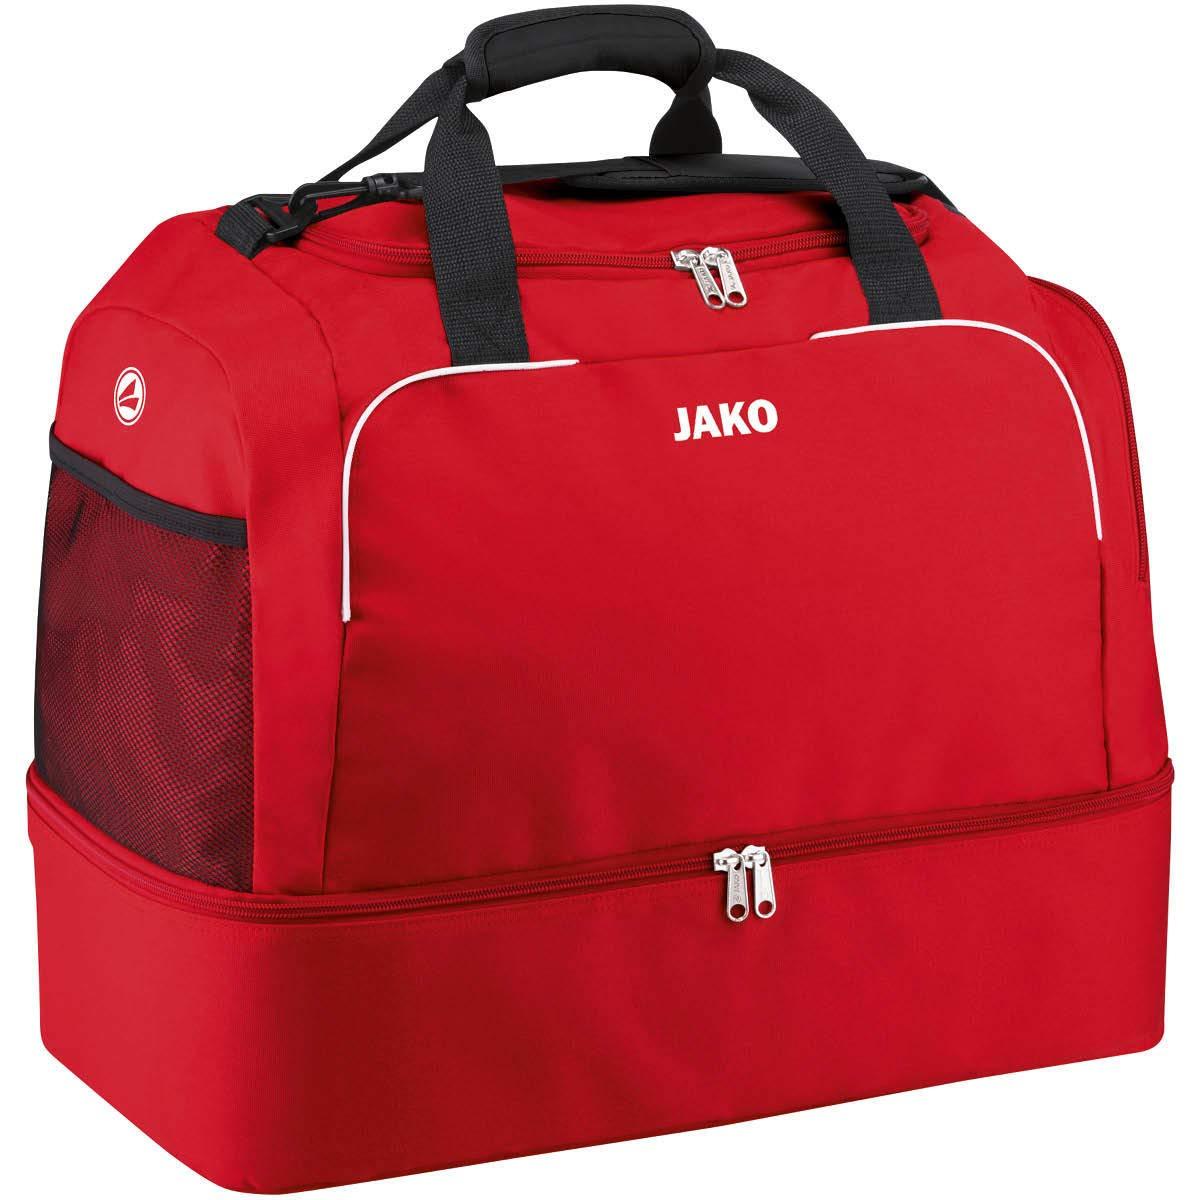 JAKO Sporttasche Classico, Rot, 60 cm